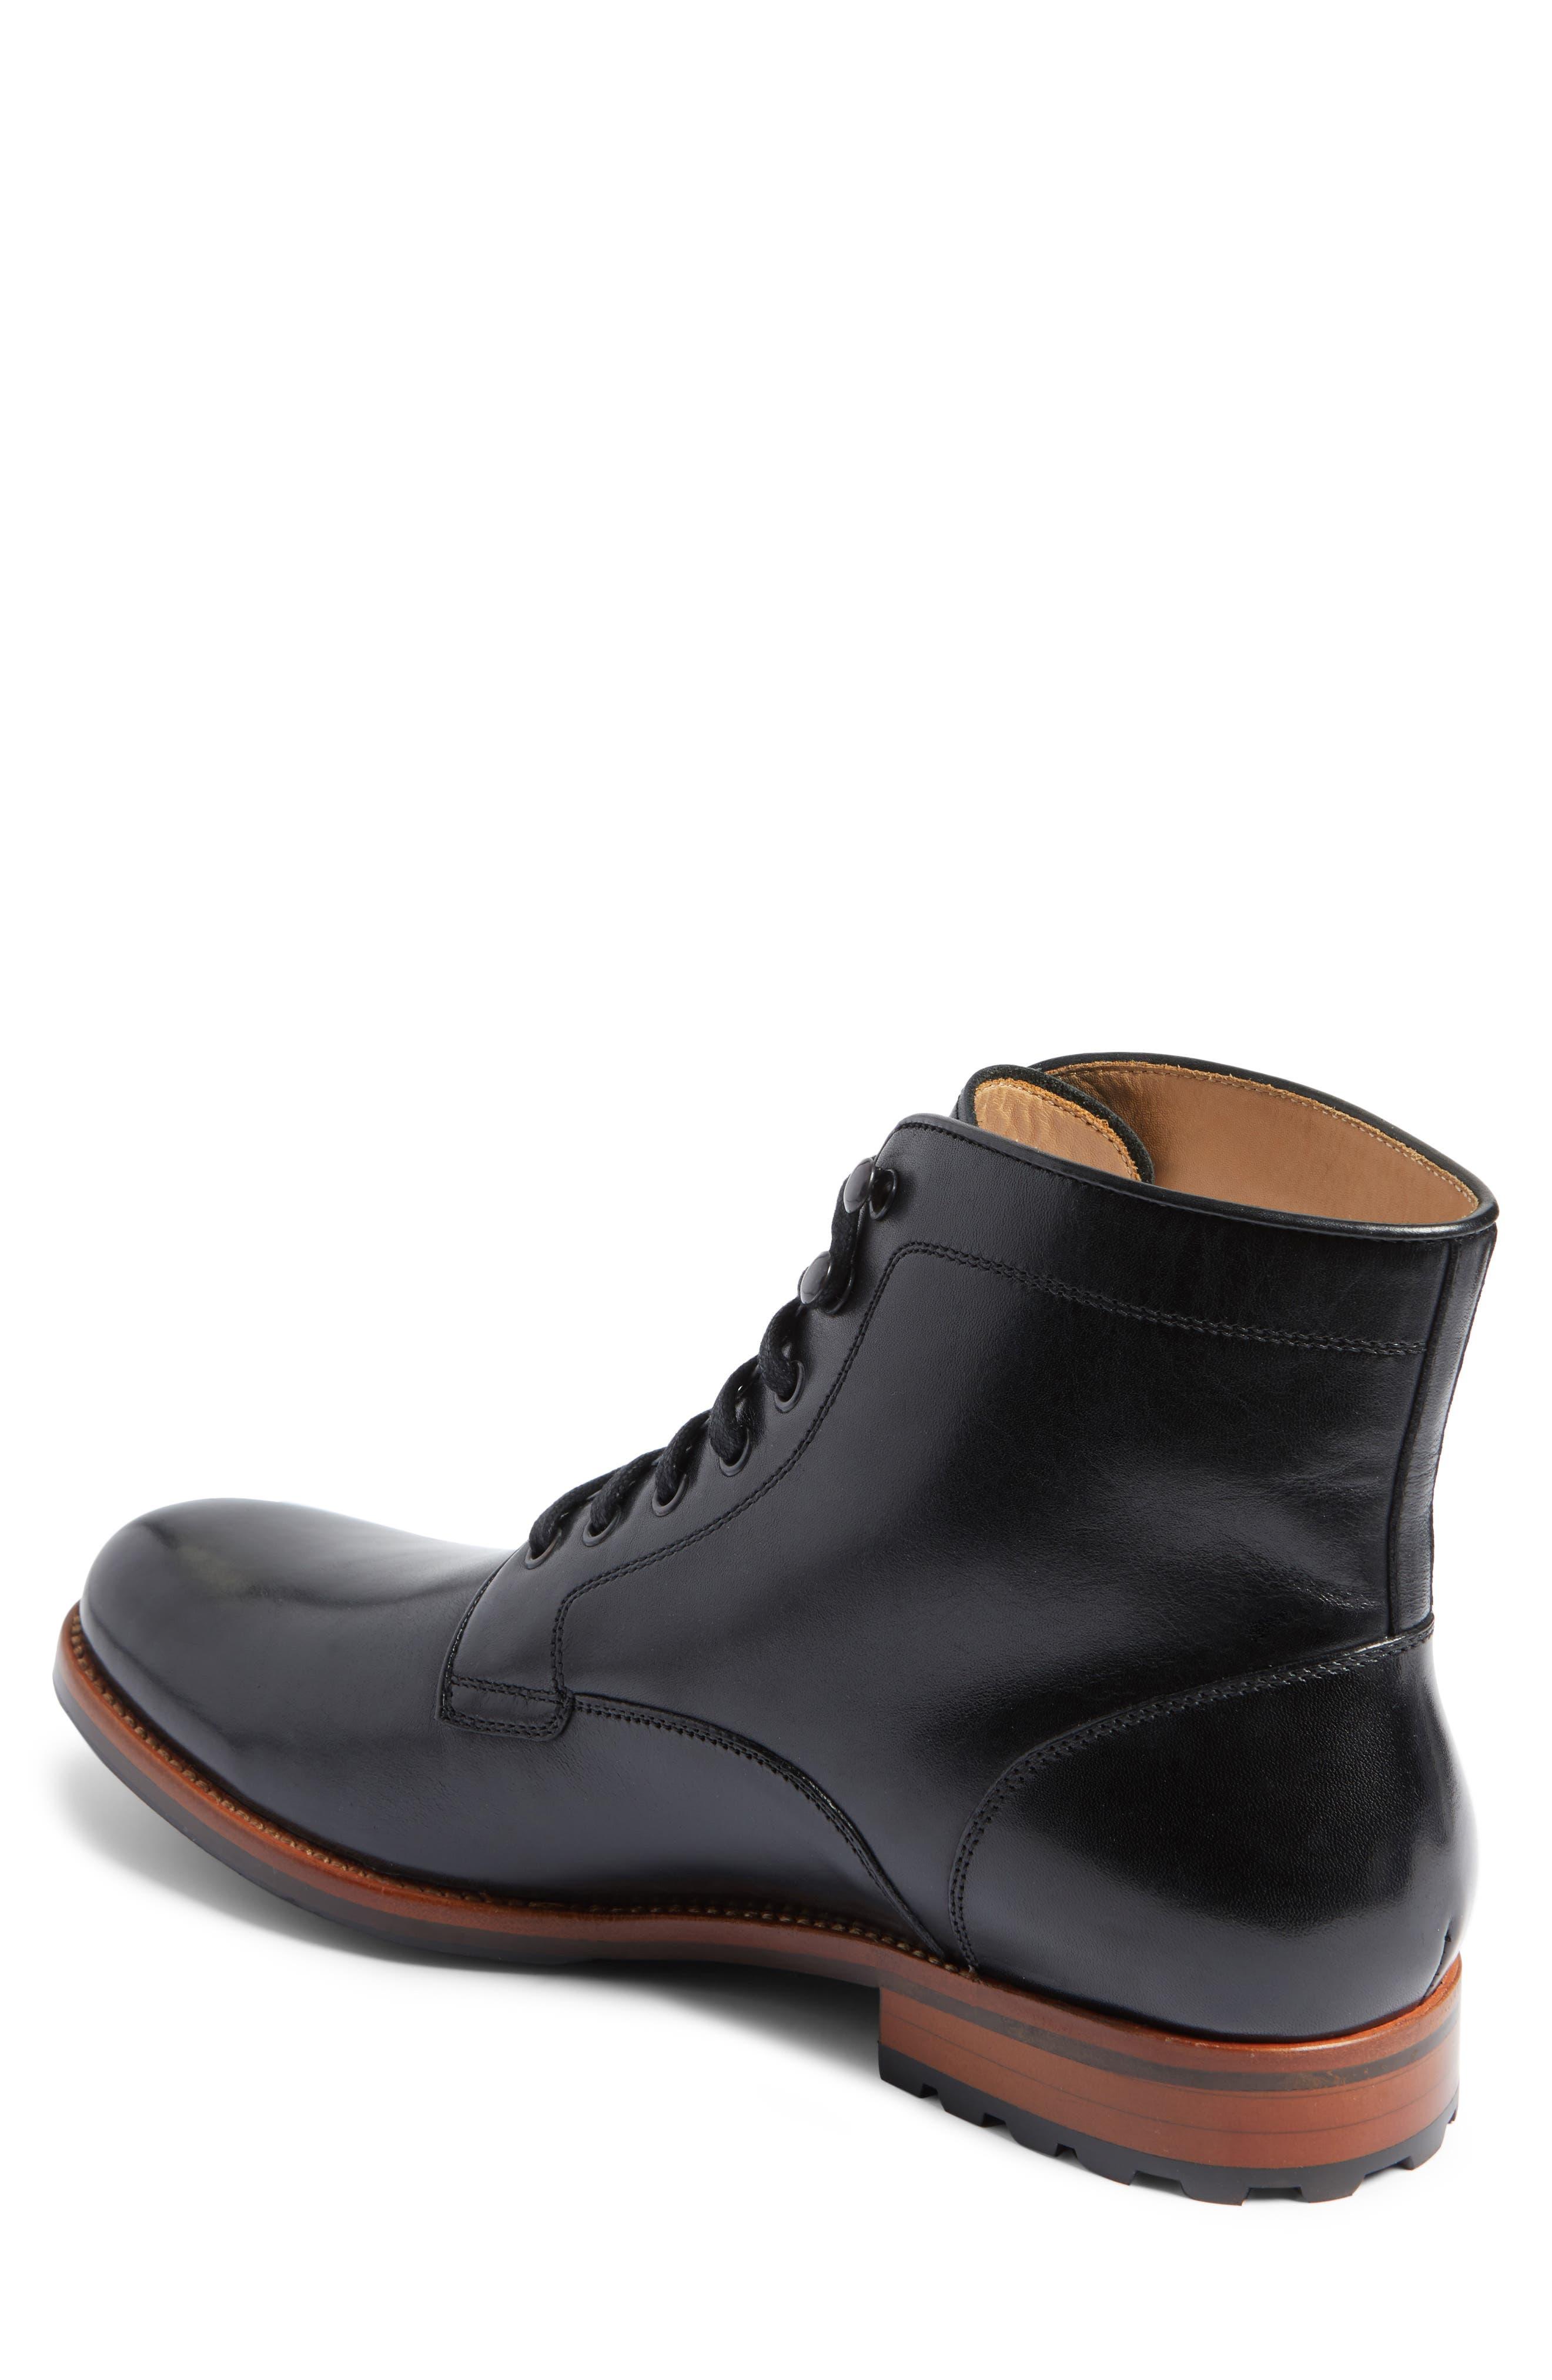 Axeford Plain Toe Boot,                             Alternate thumbnail 2, color,                             001